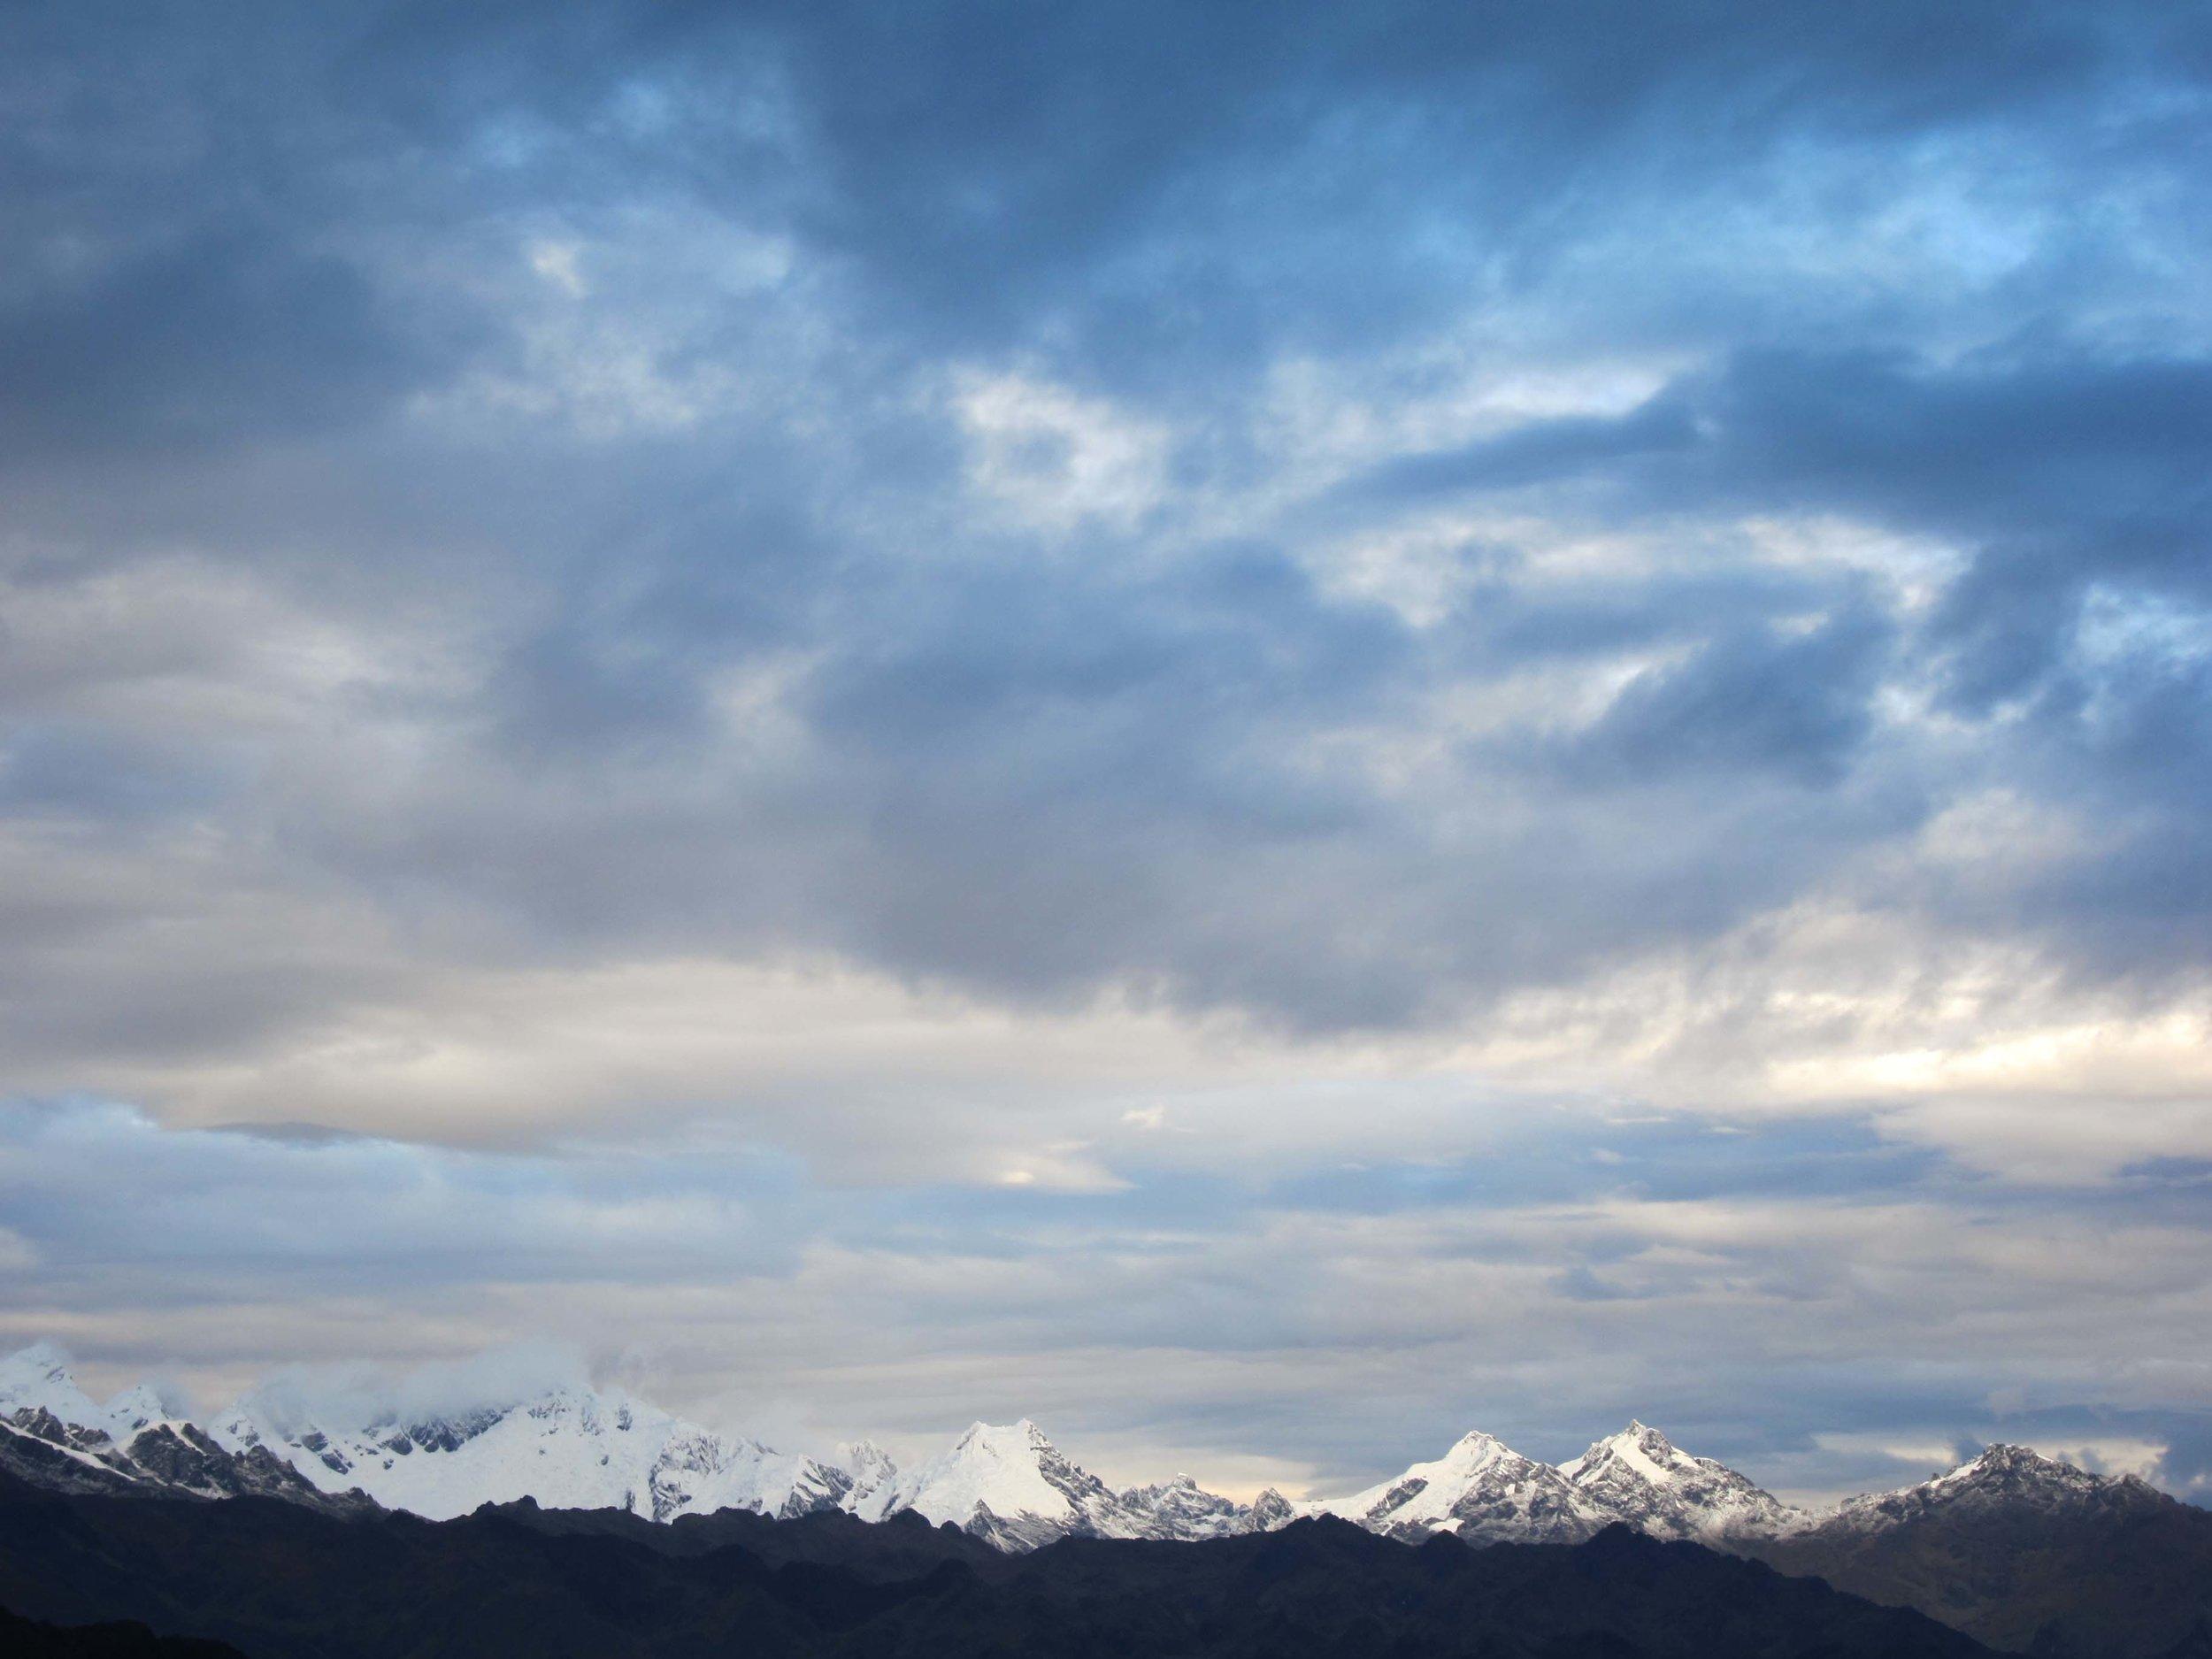 View from Chaquicocha, Inca Trail